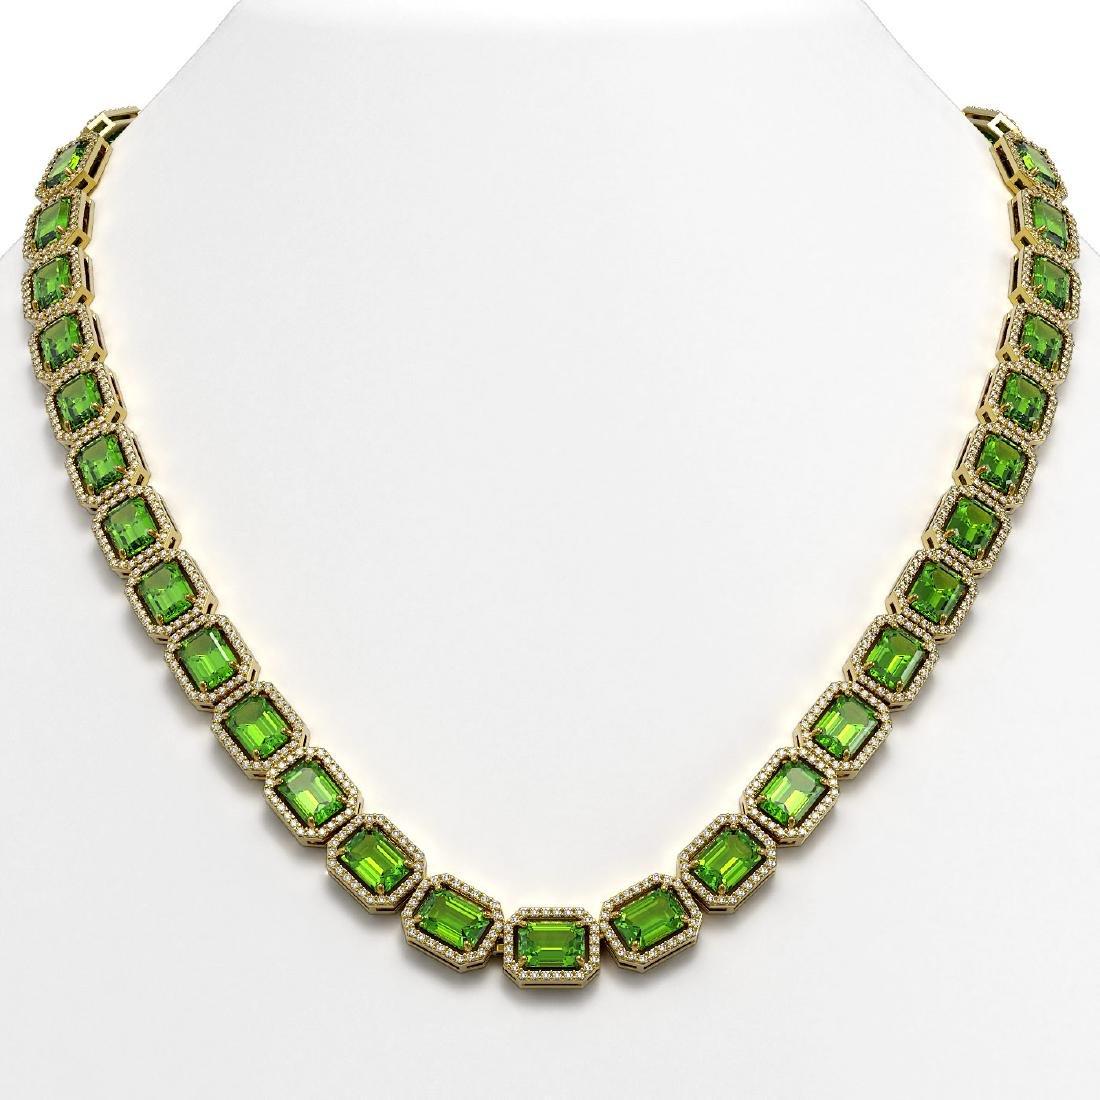 57.3 CTW Peridot & Diamond Halo Necklace 10K Yellow